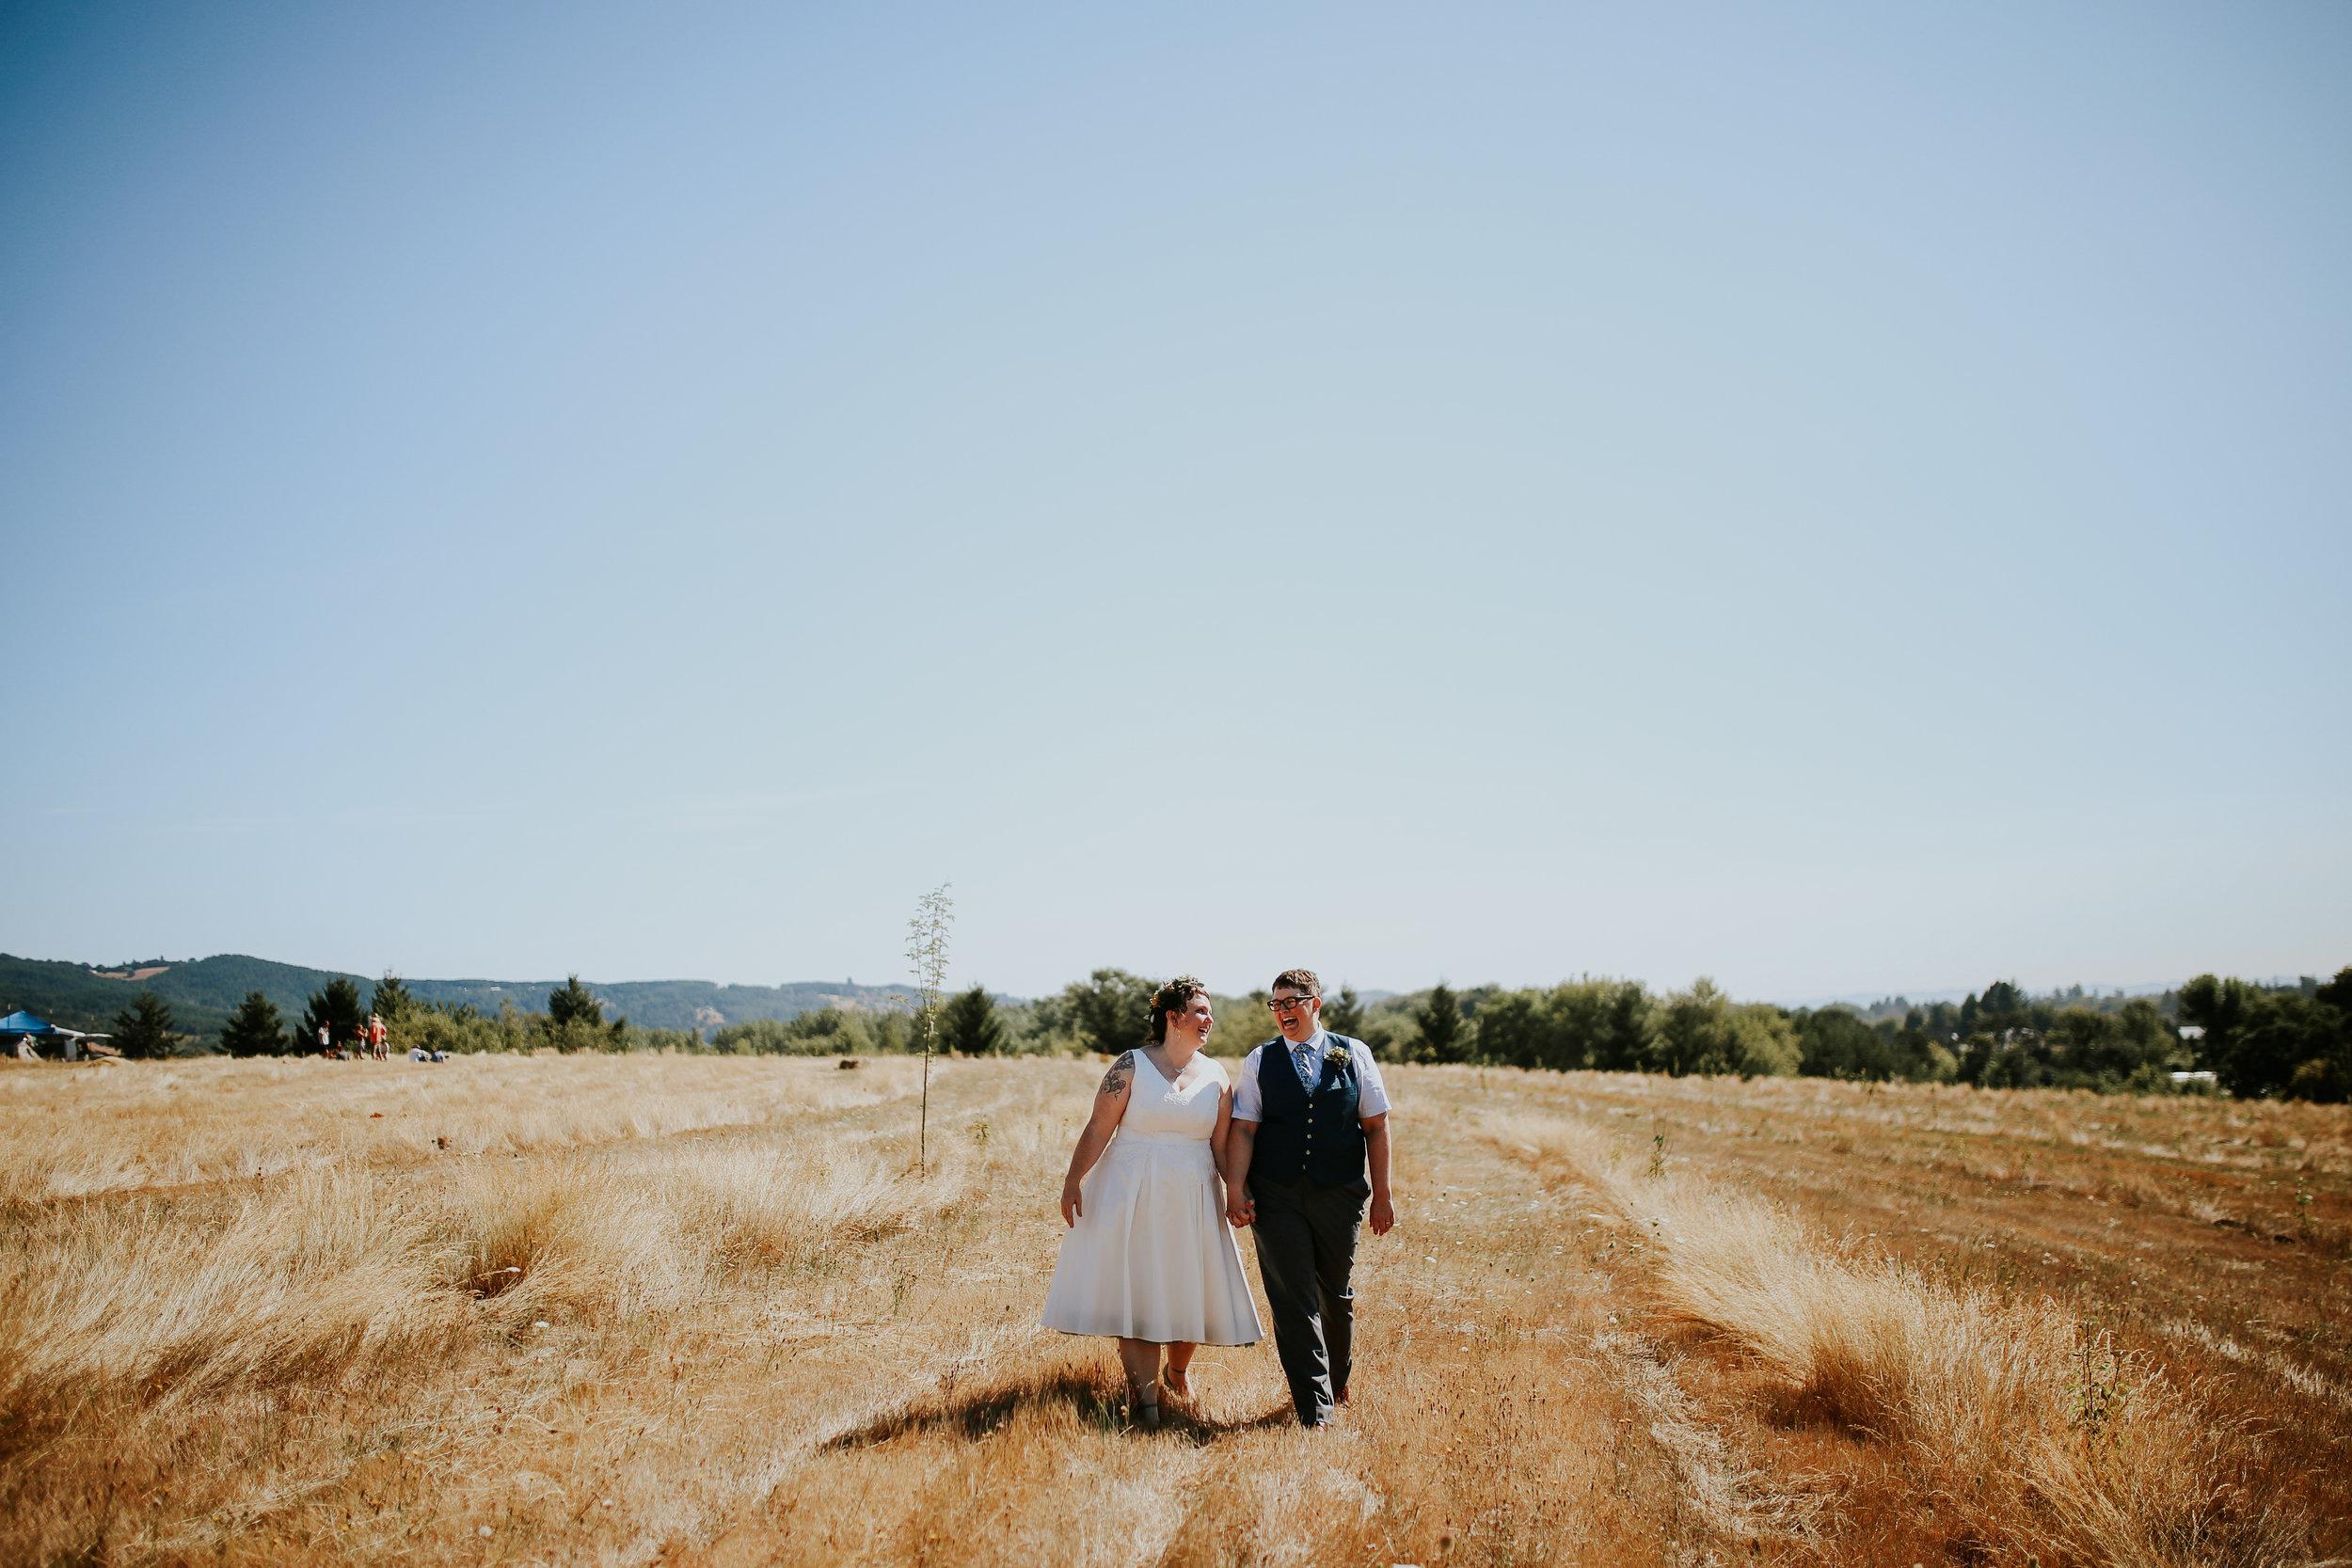 eclipse-wedding-kt-bdub-portland-jamiecarle-9415.jpg